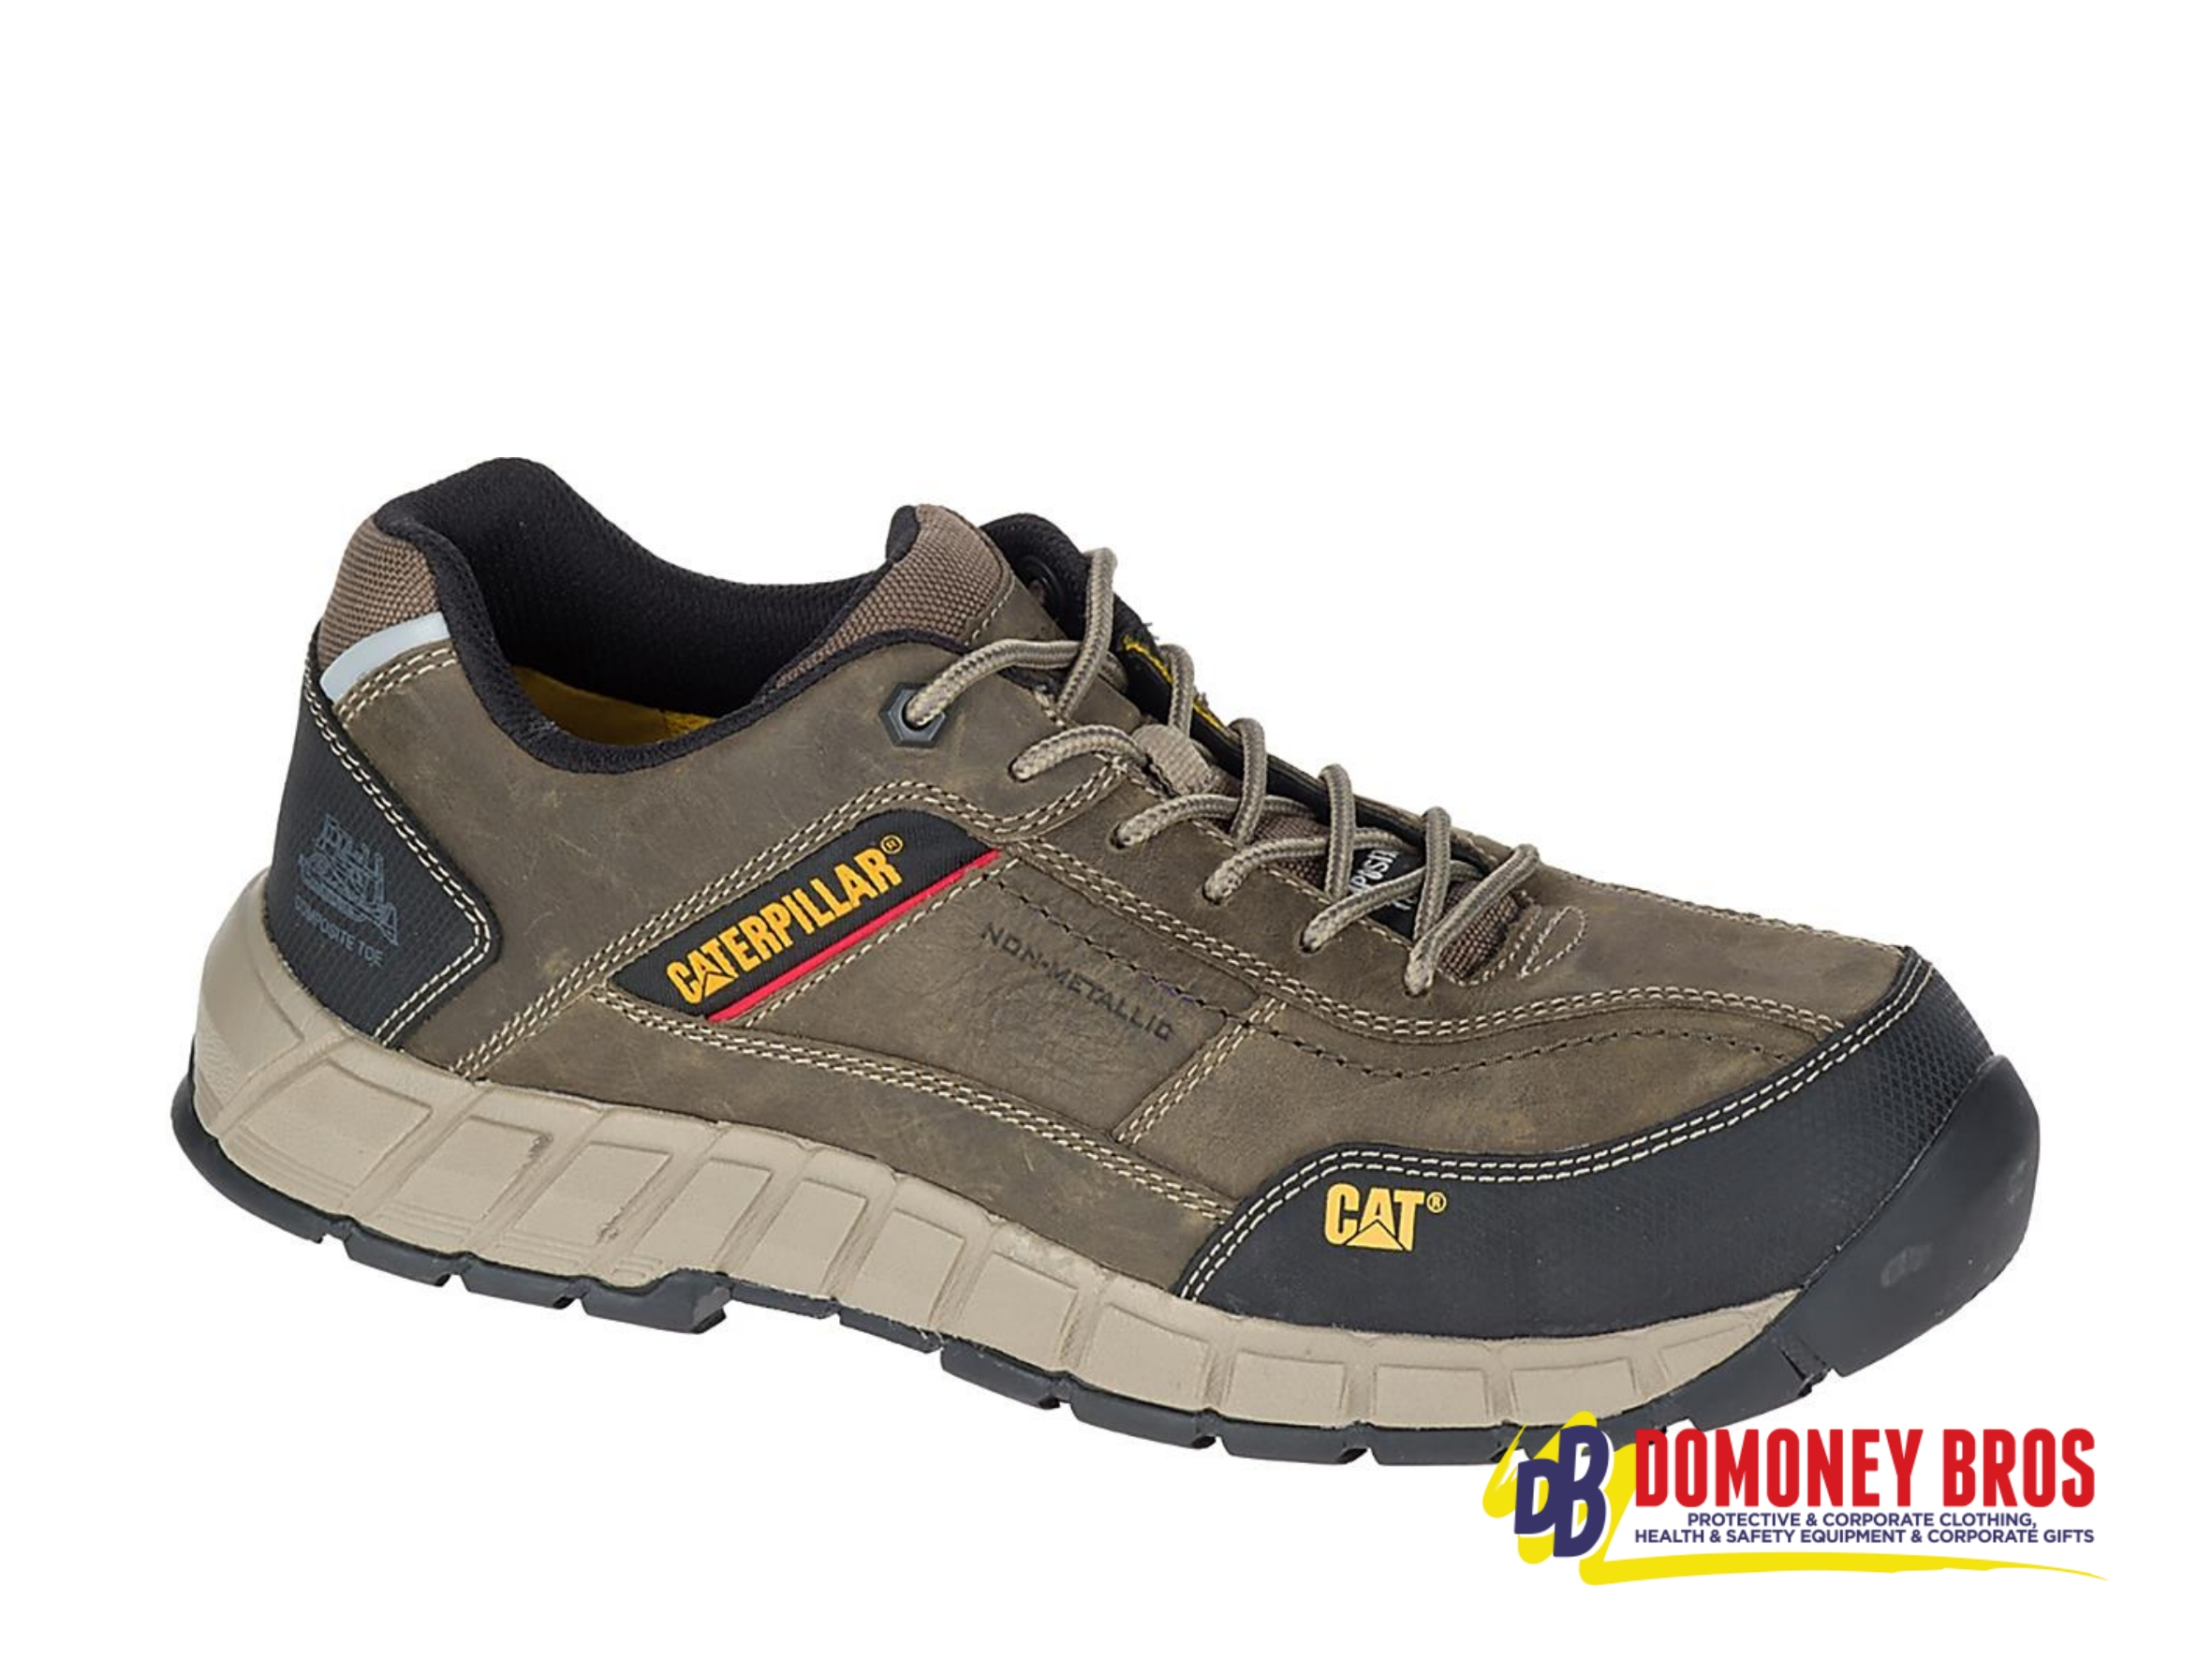 Caterpillar Streamline Safety Shoe